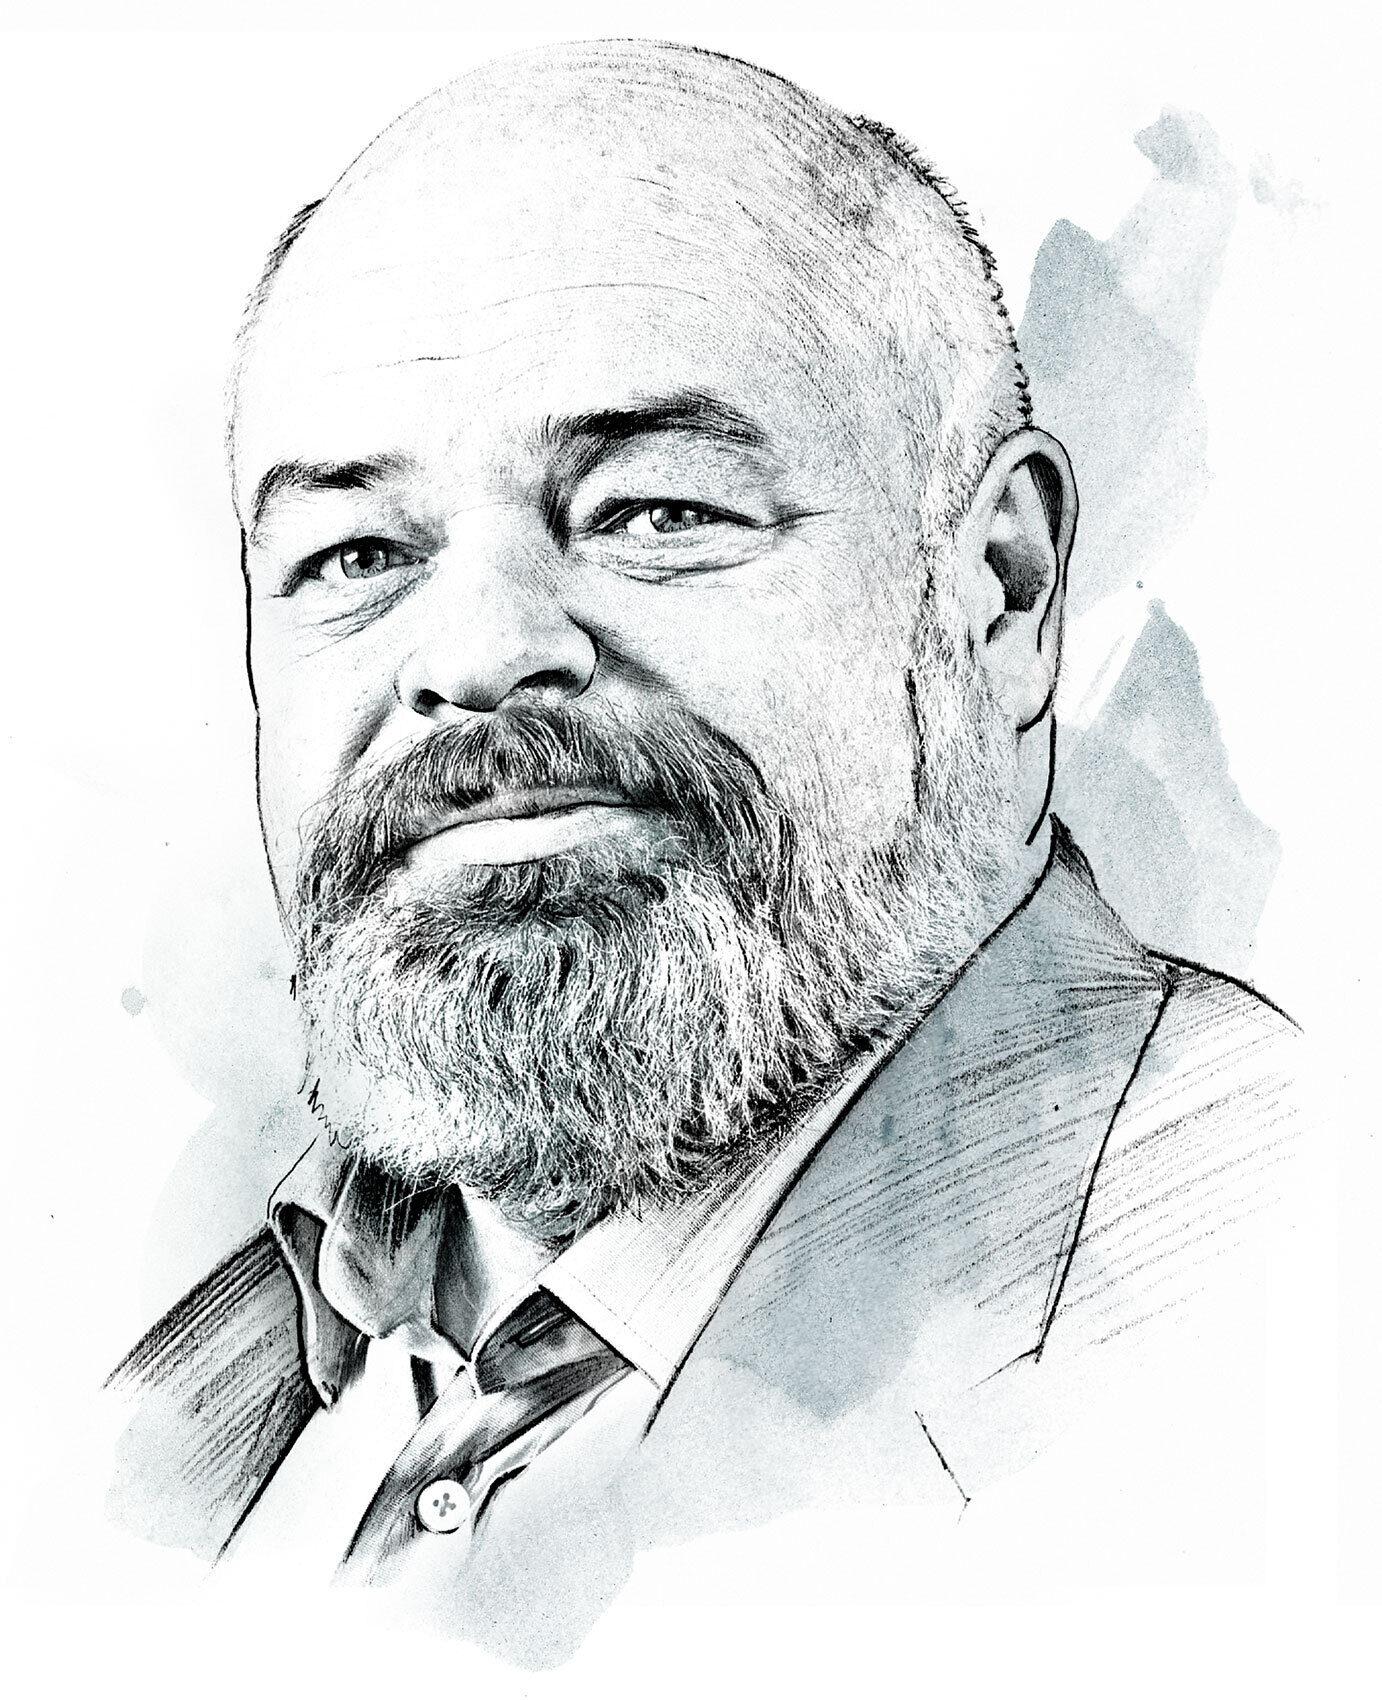 Dr Harry Telser portrait illustration - Kornel Illustration | Kornel Stadler portfolio